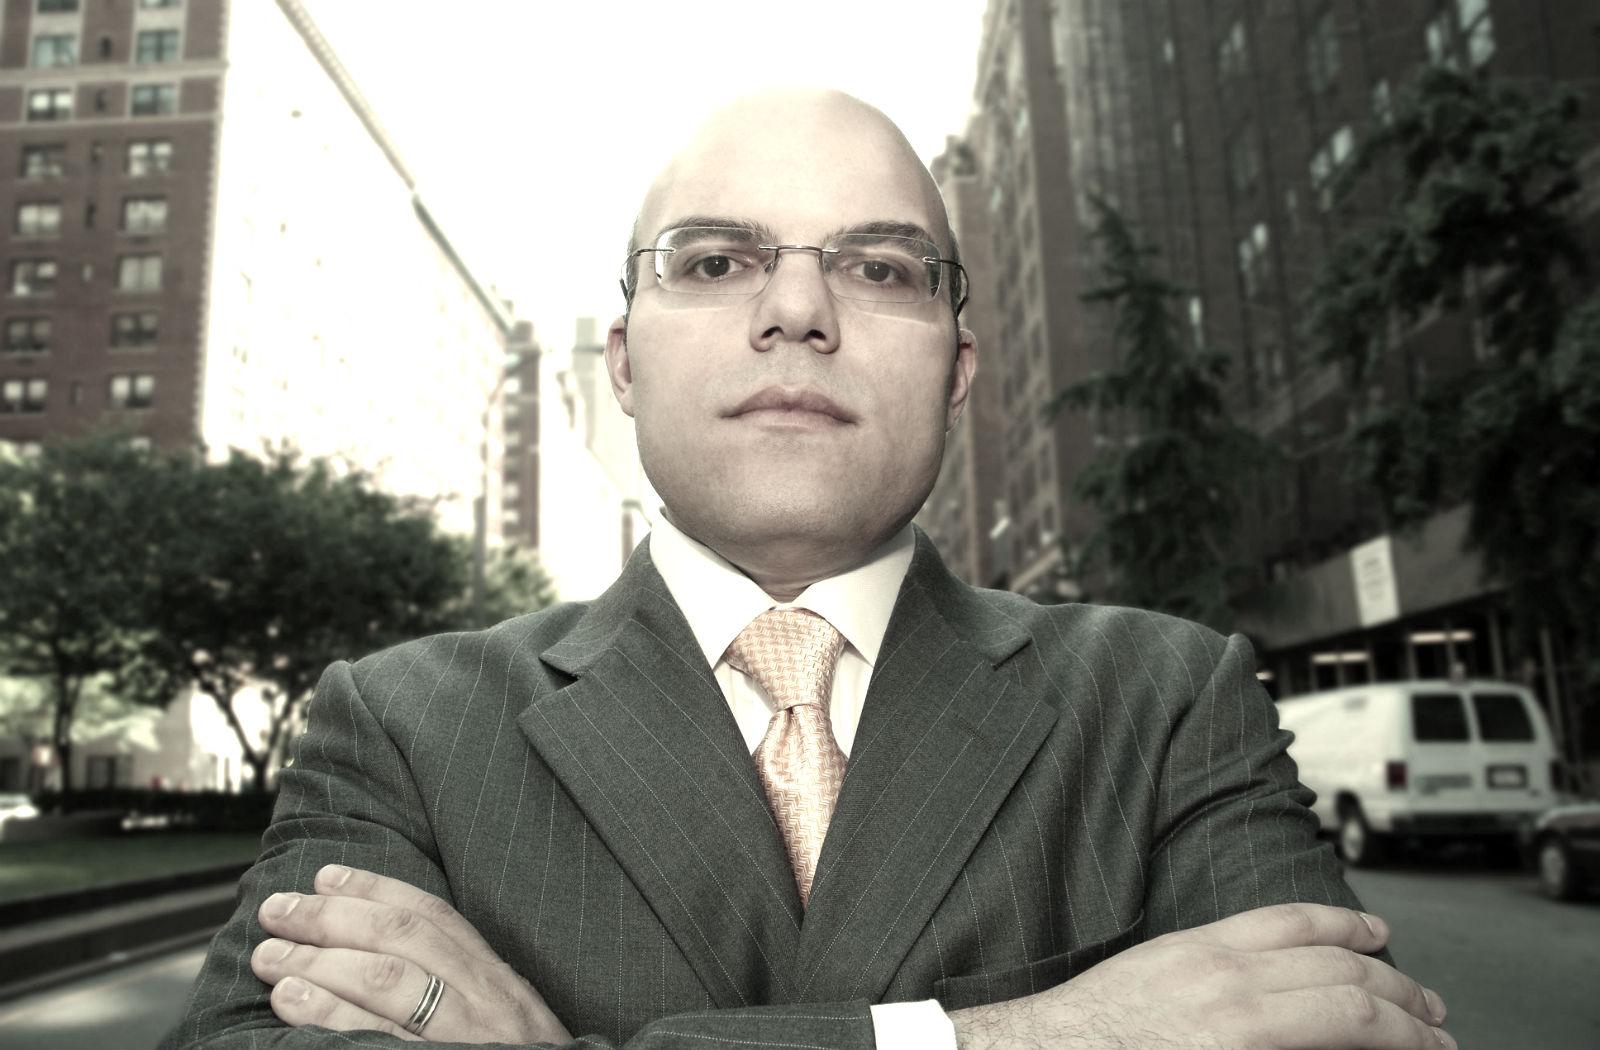 Small business finance expert Mike Periu discusses Cómo sacarles provecho a los programas para empresarios minoritarios en Abasto Magazine